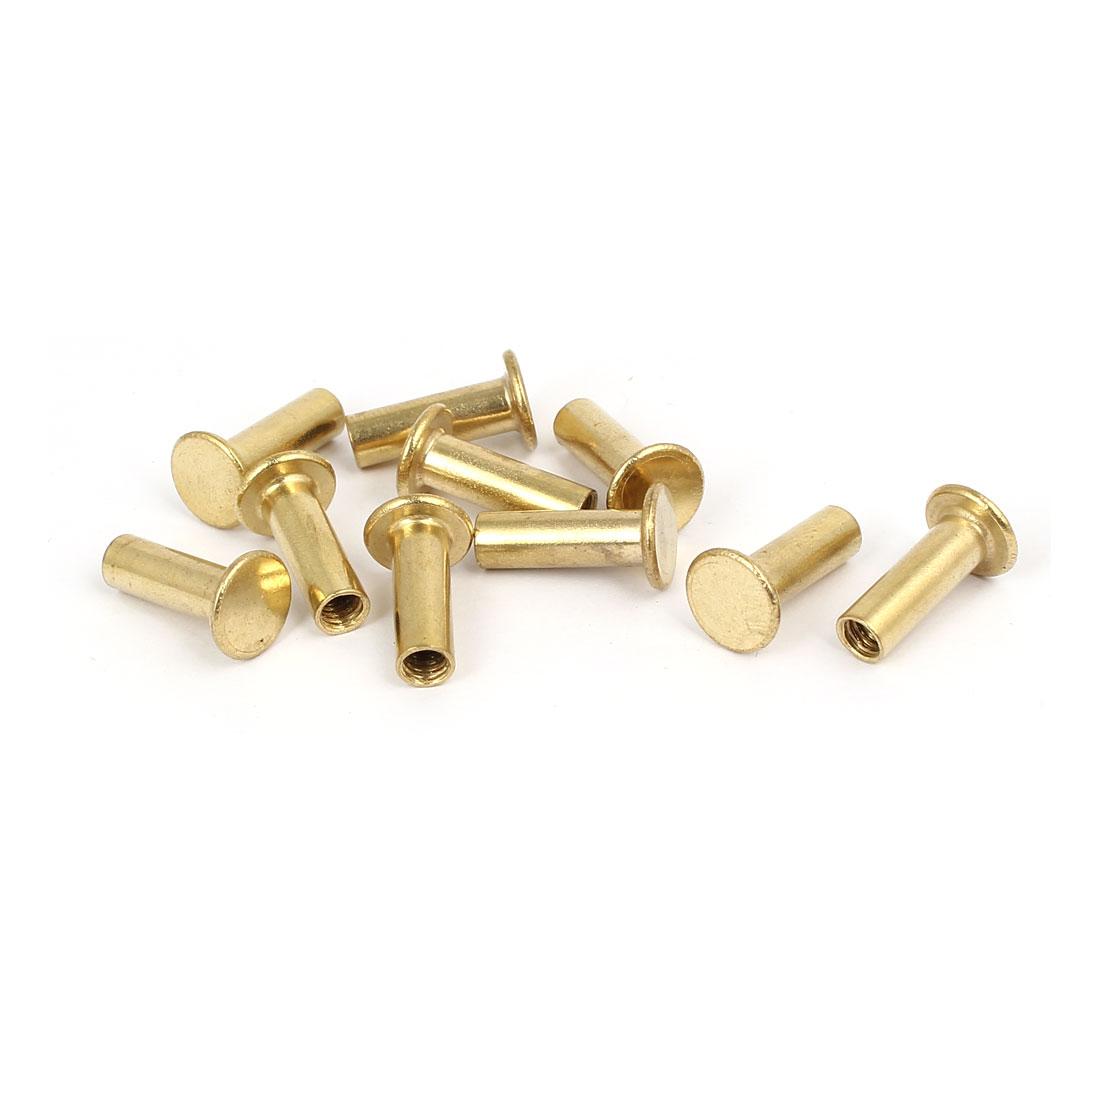 Photo Album Metal Brass Plated Binding Screw Post Barrel Nut 5mmx15mm 10pcs